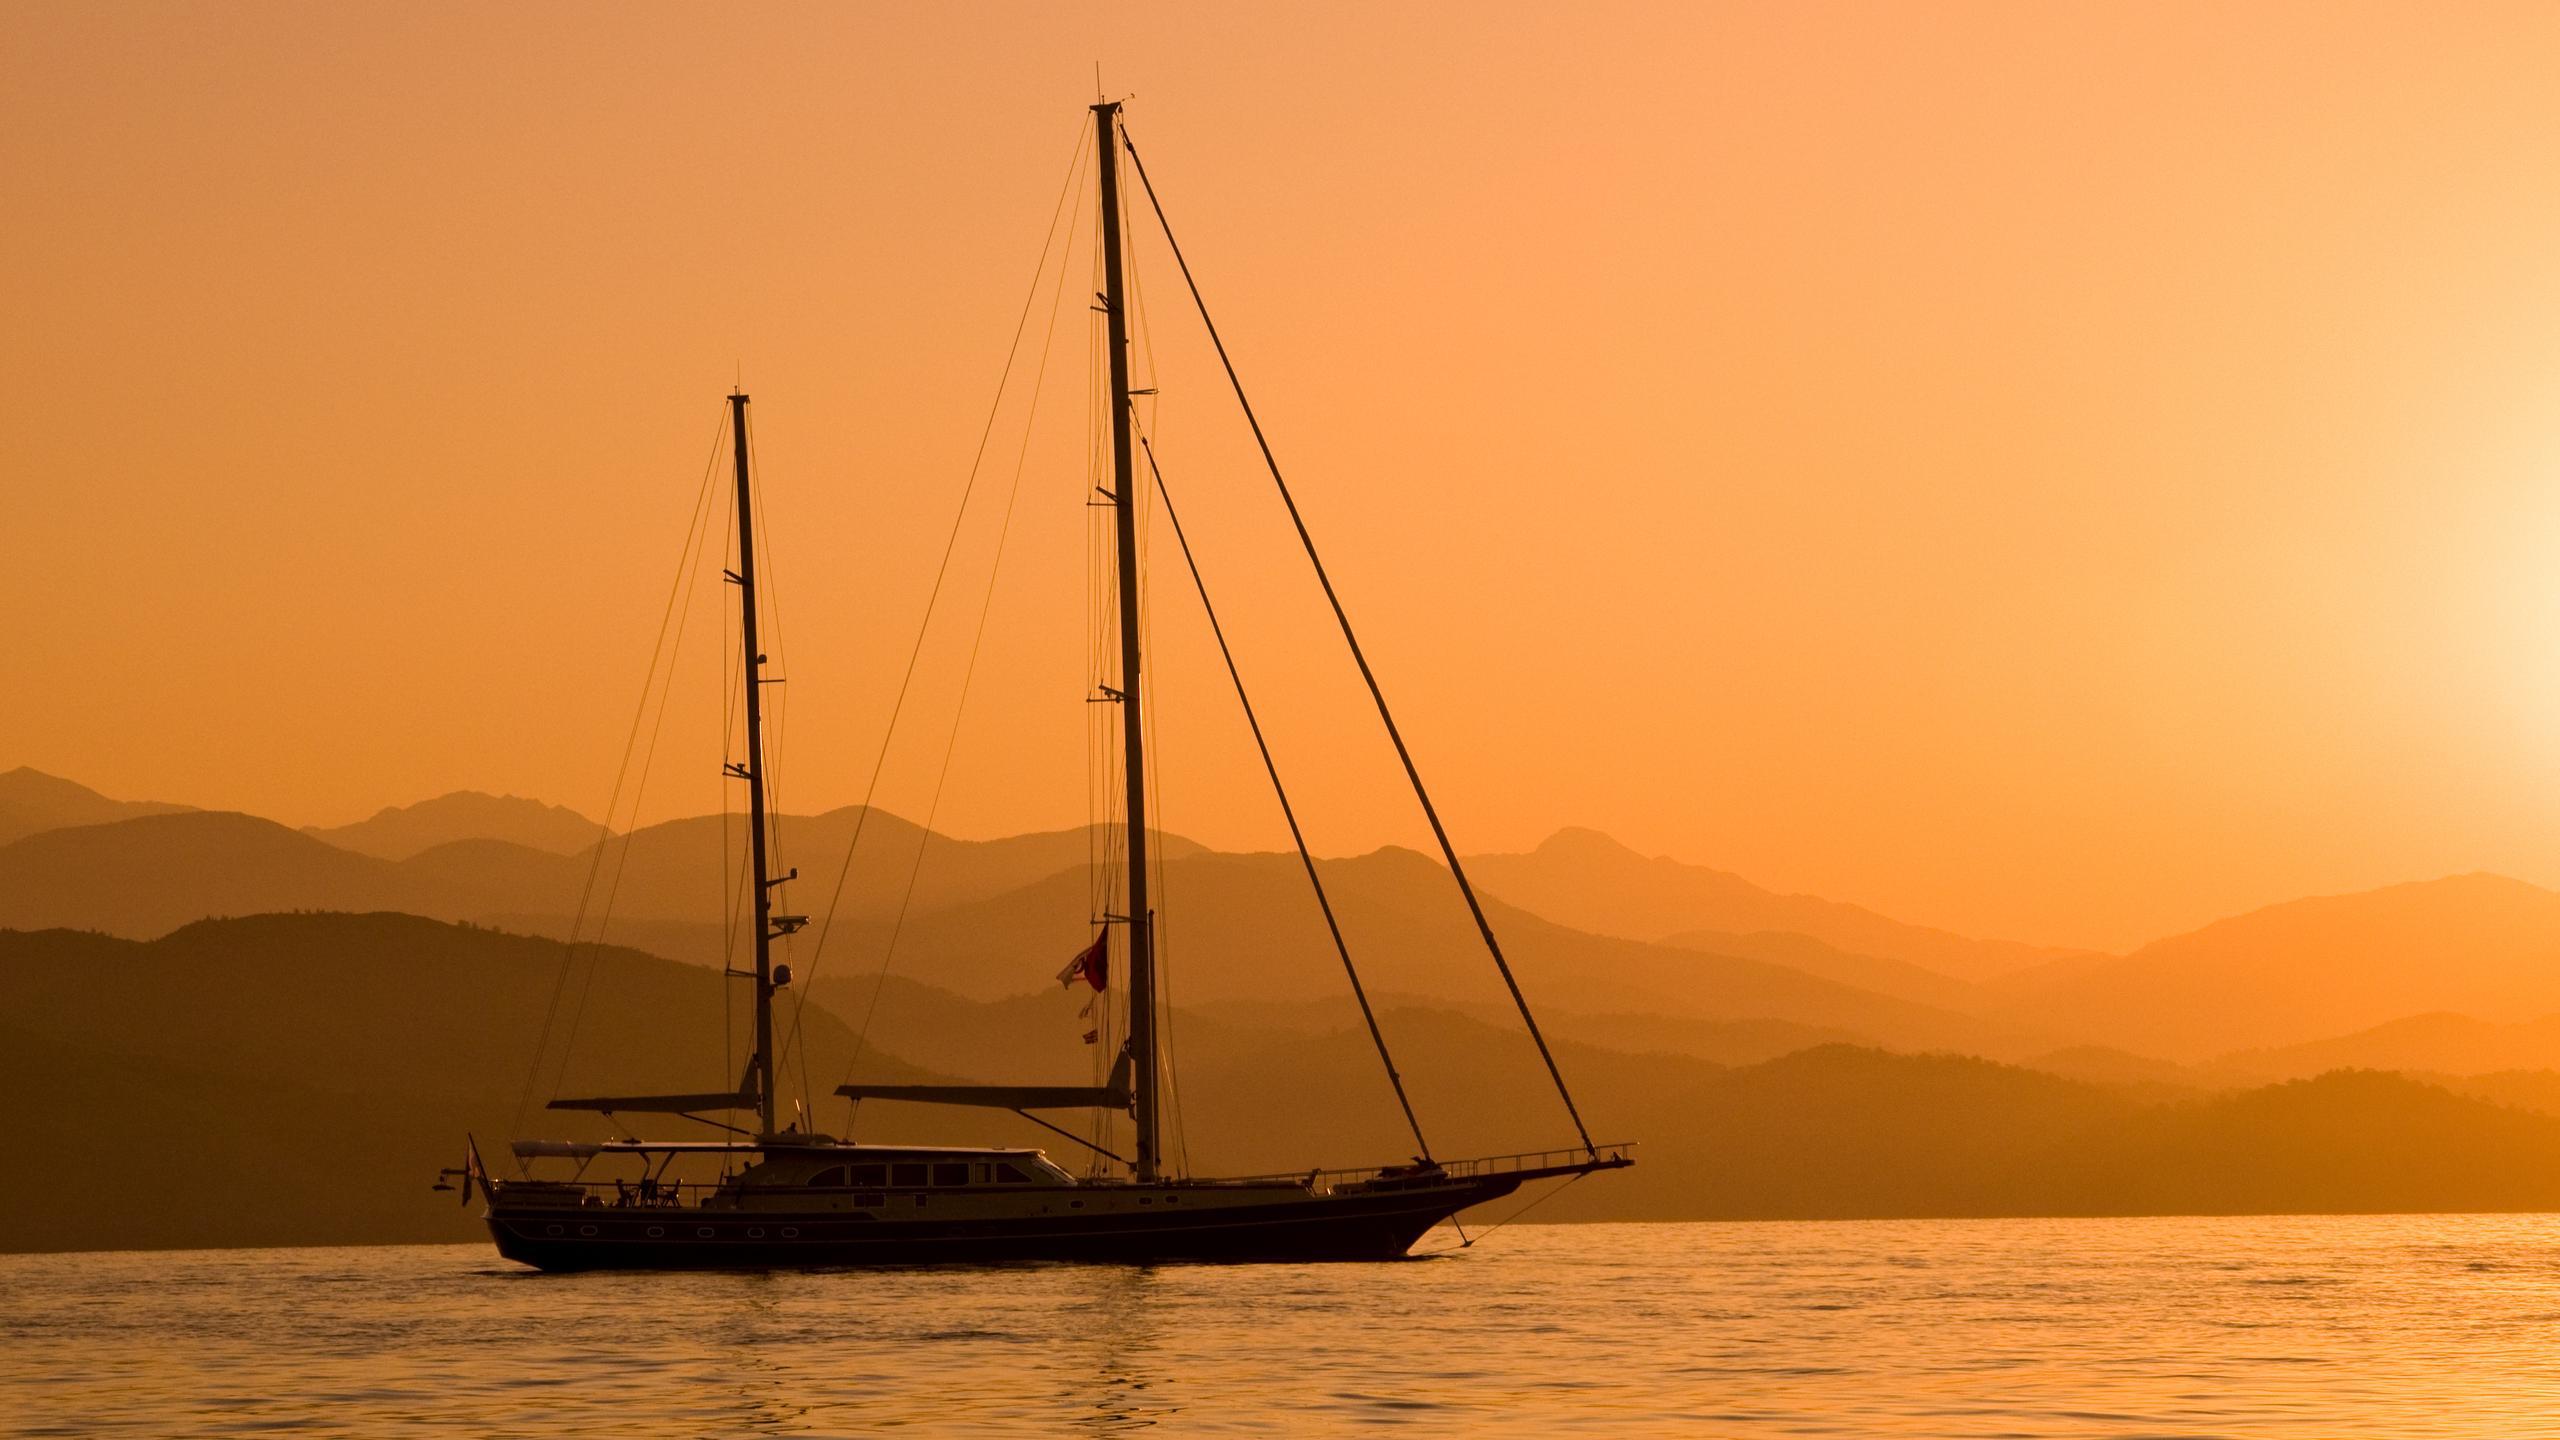 daima-yacht-sailing-sunset